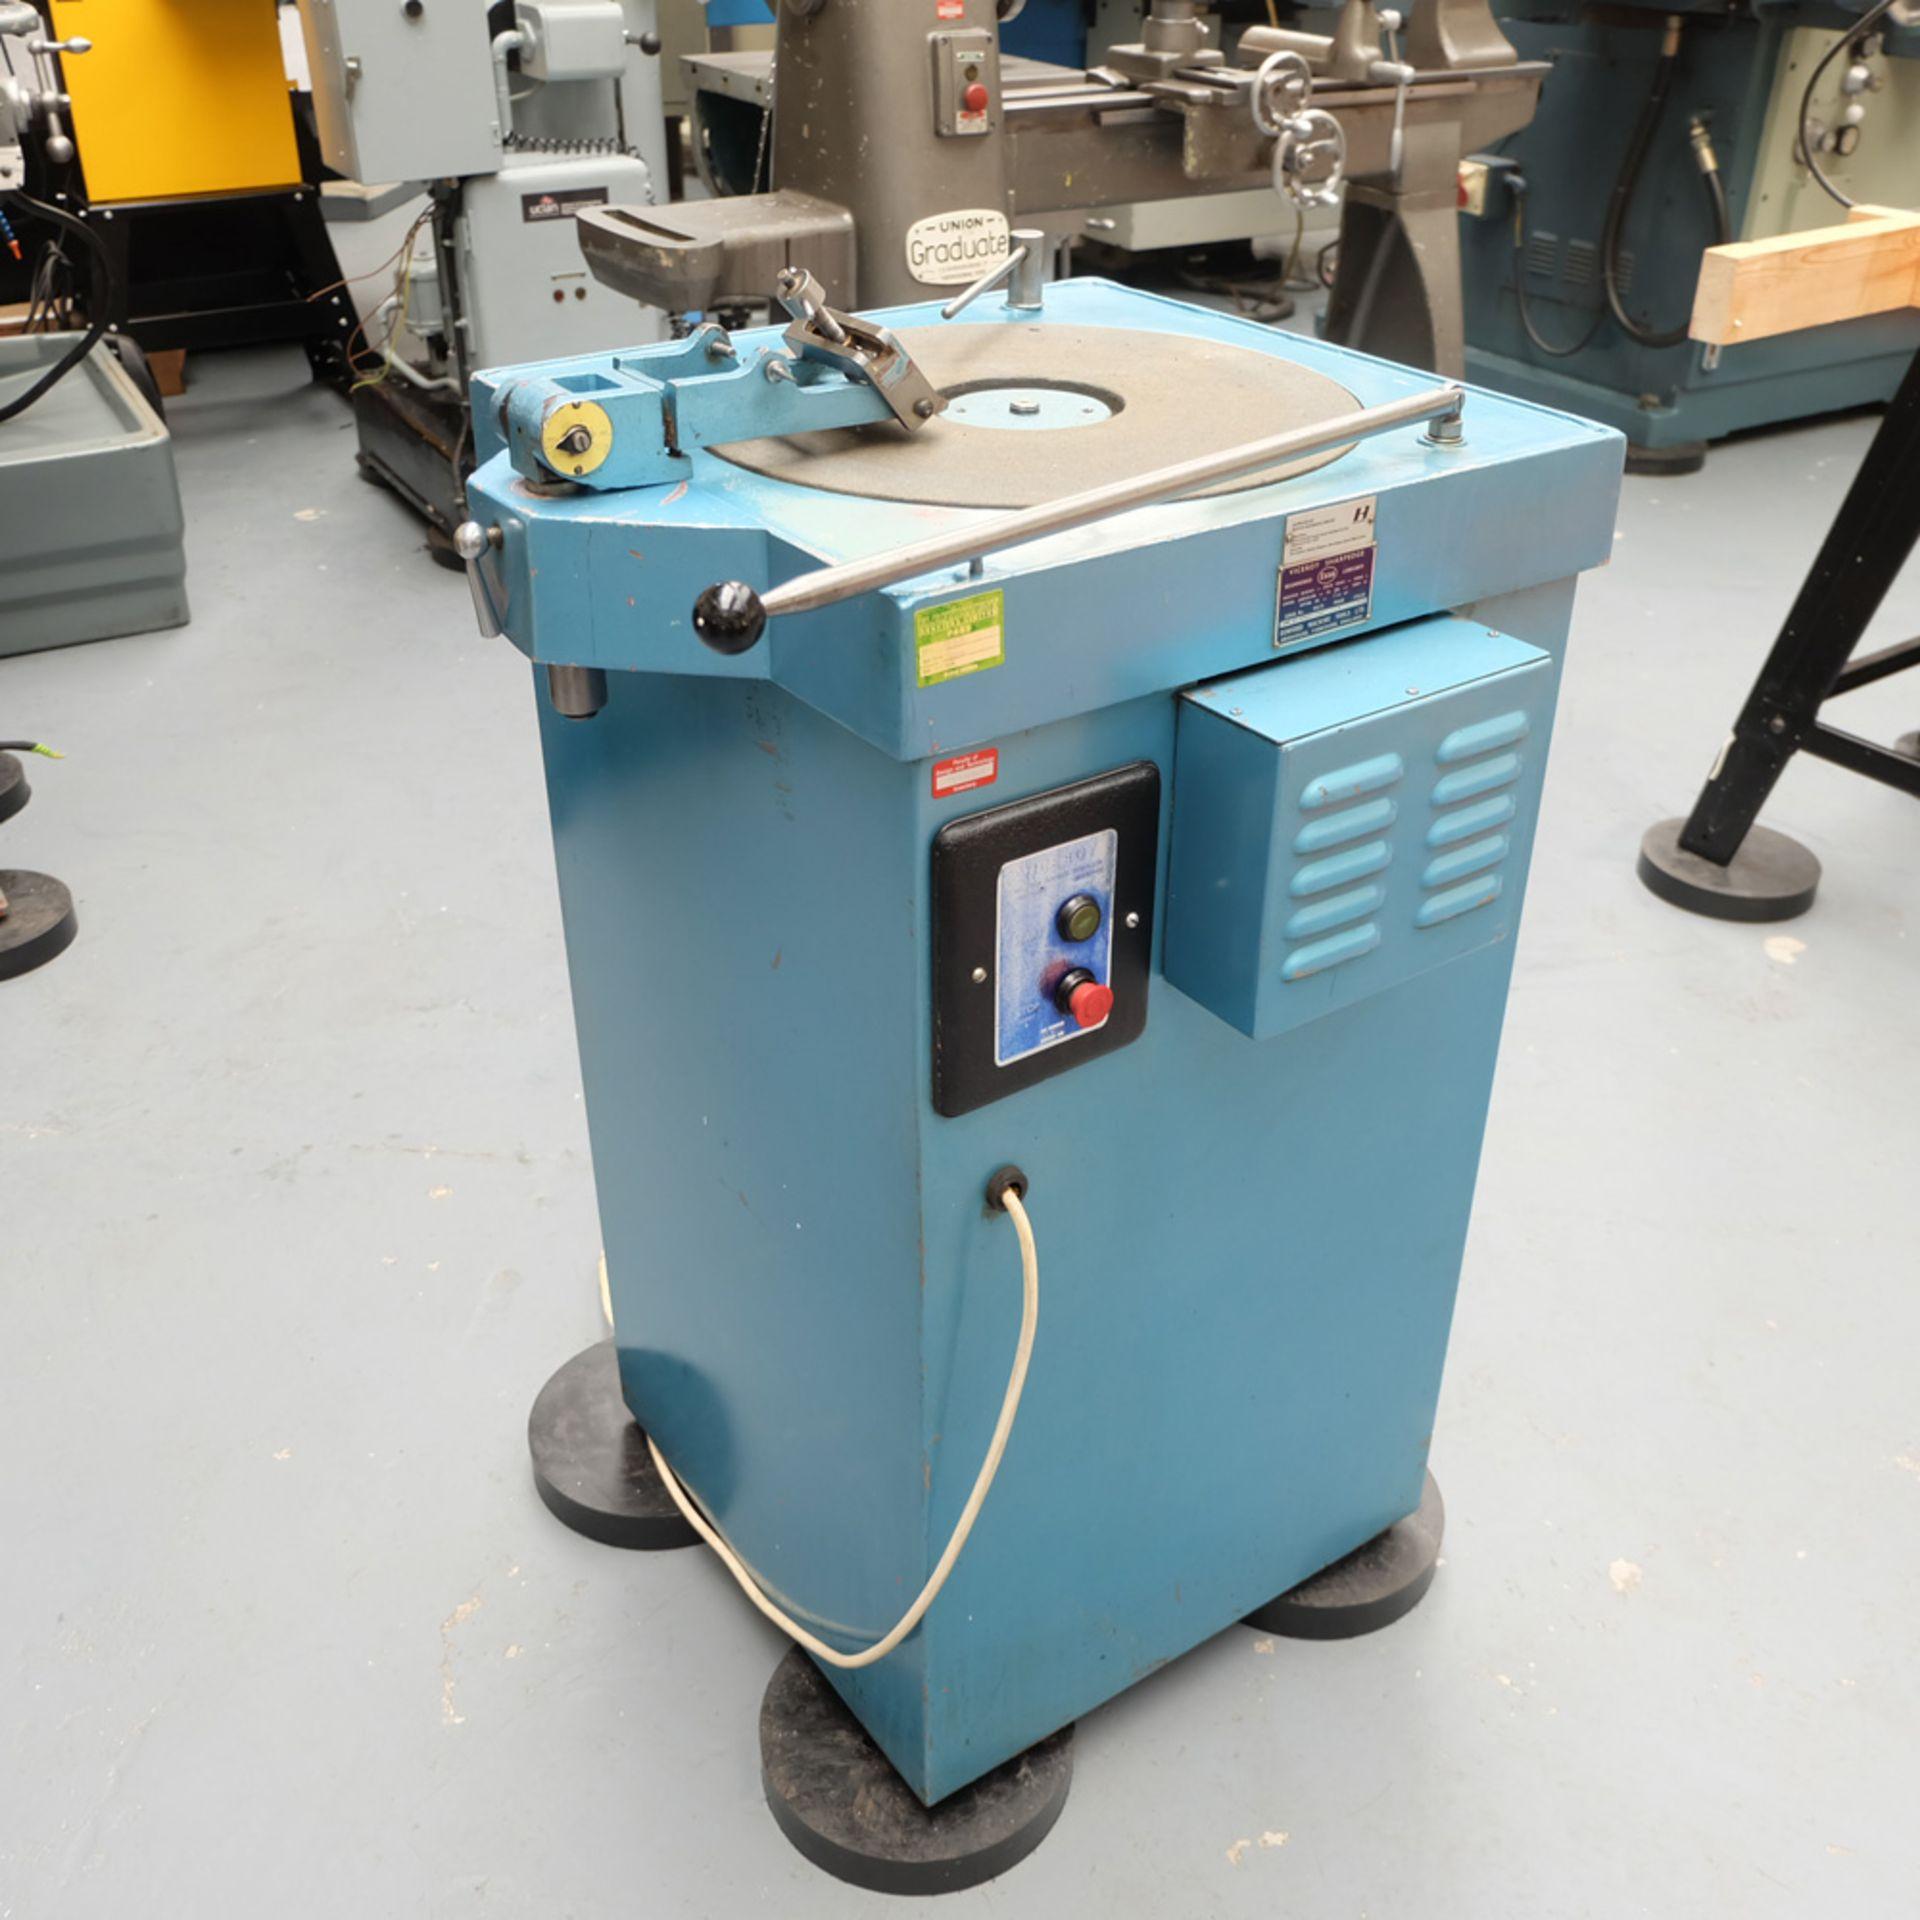 Viceroy Sharpedge Model TDS 12/16 Edge Tool Sharpening Machine.